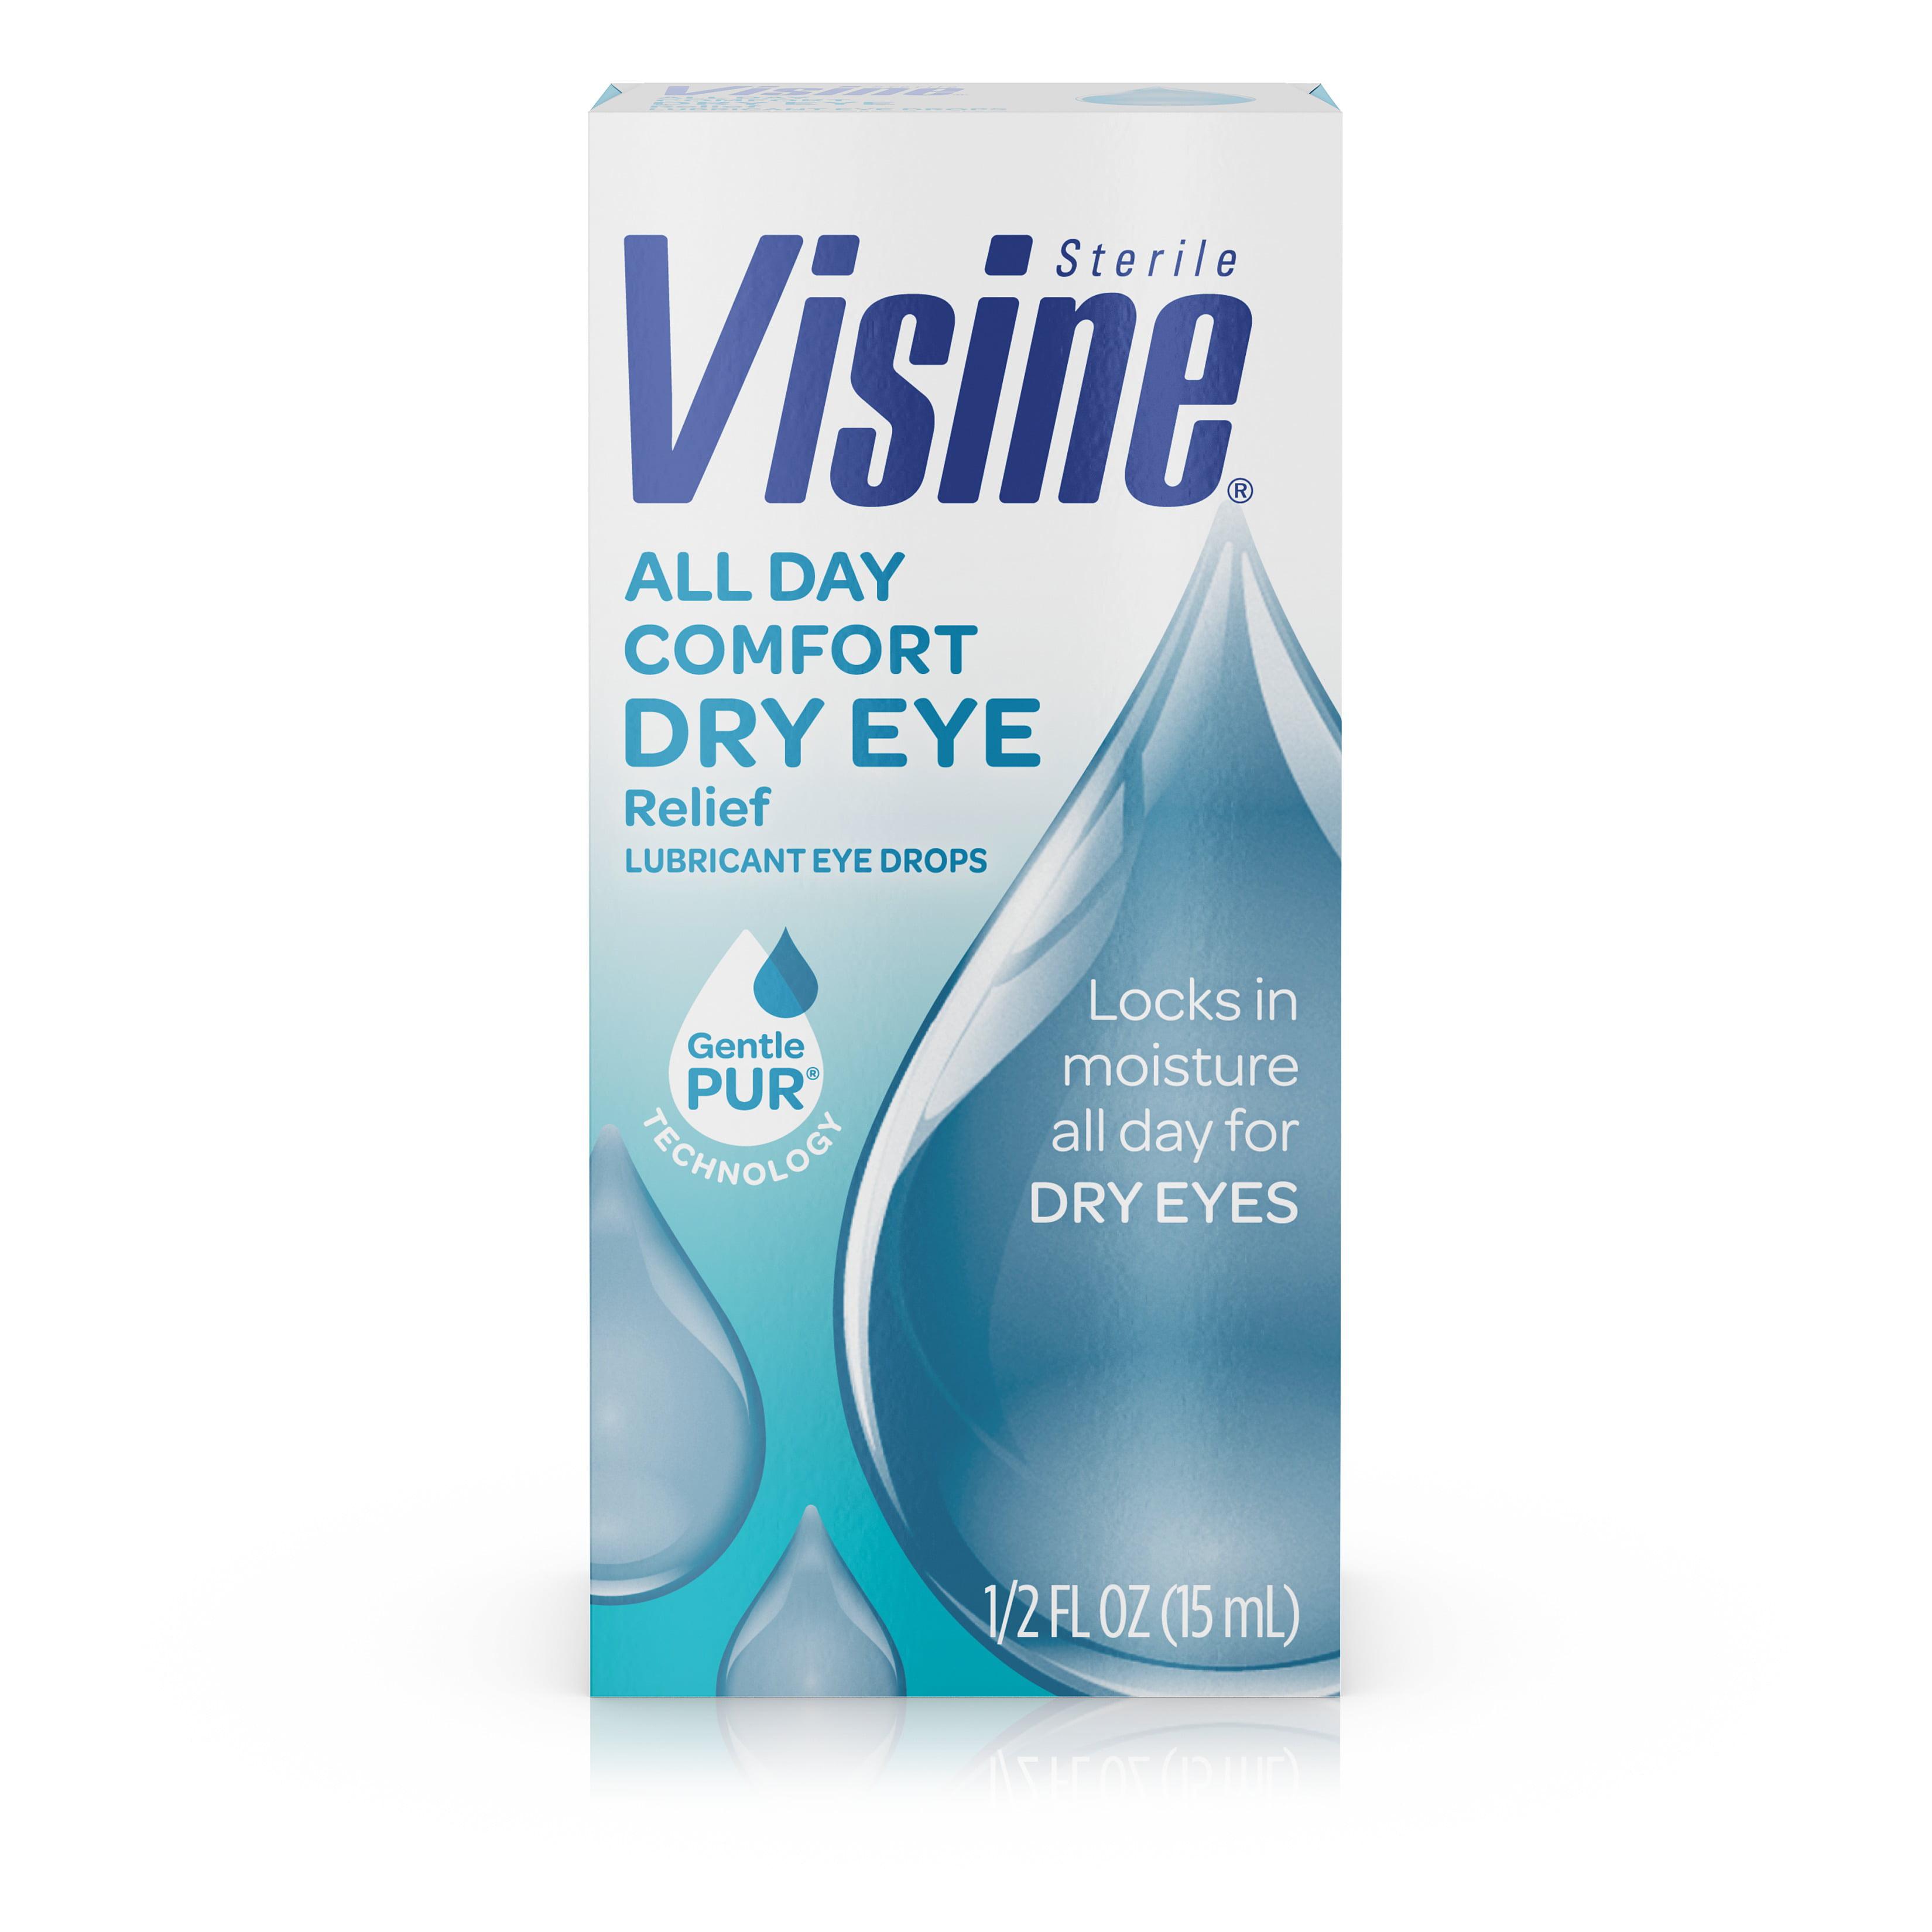 Visine All Day Comfort Dry Eye Relief Eye Drops, 0.5 fl. oz